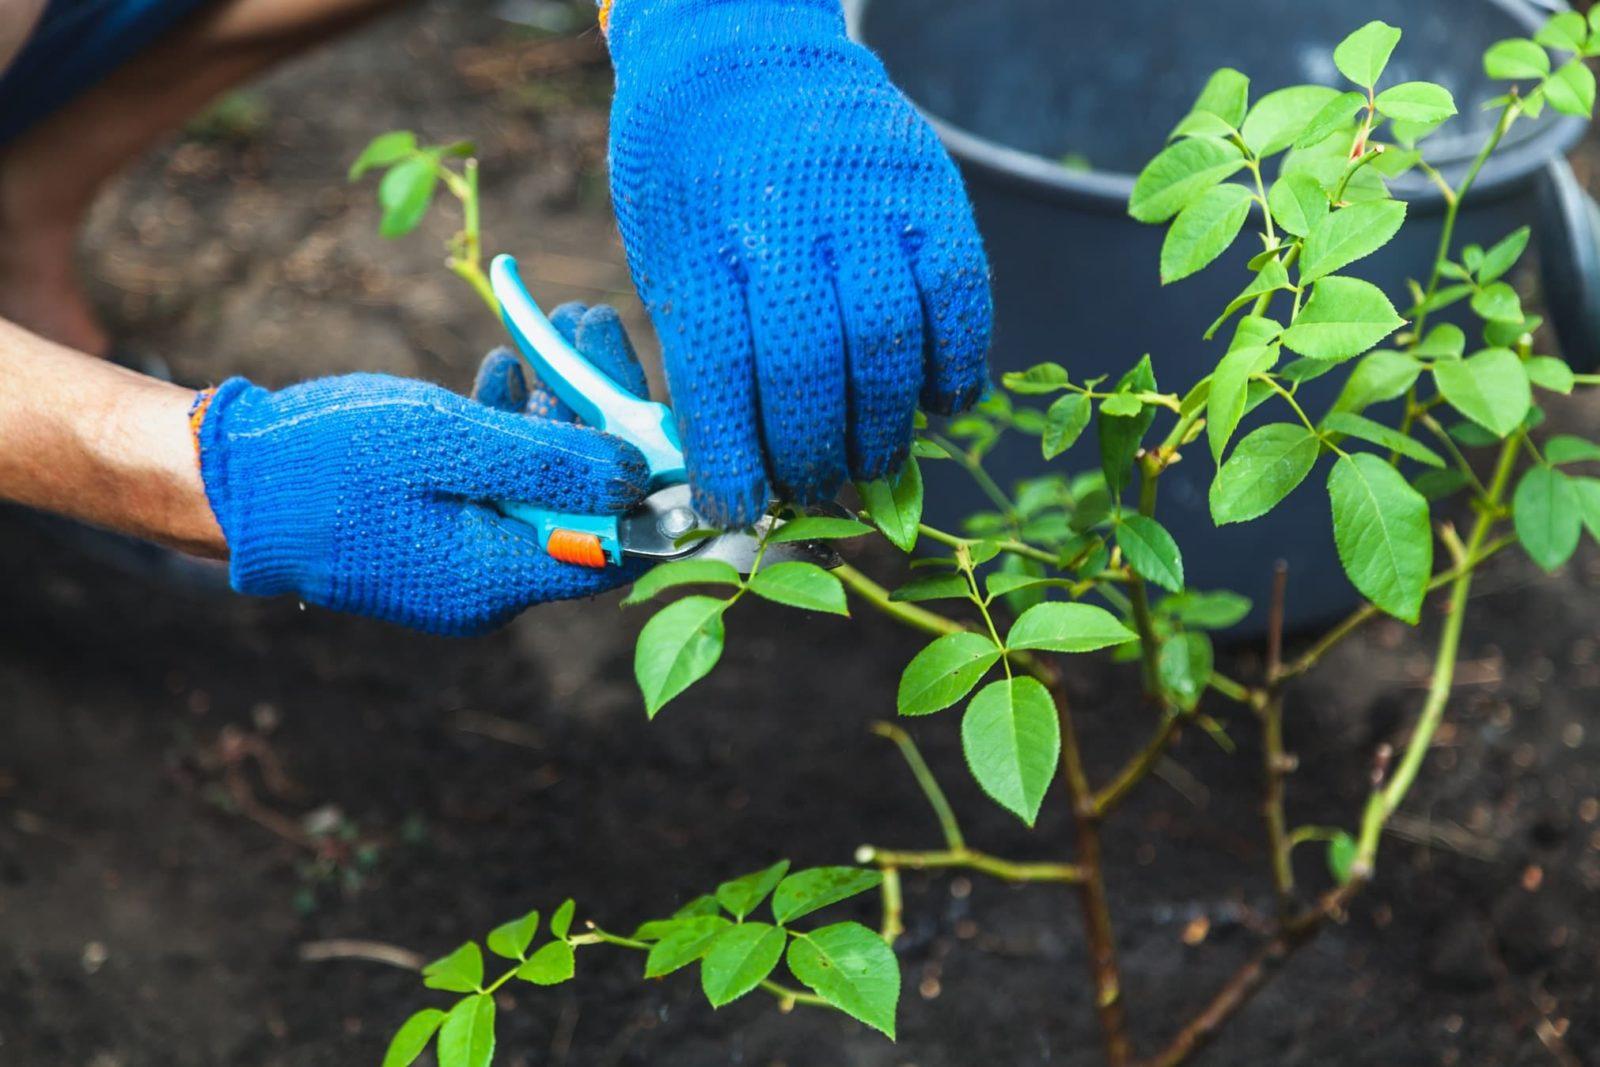 gardener in blue gloves pruning rose bushes